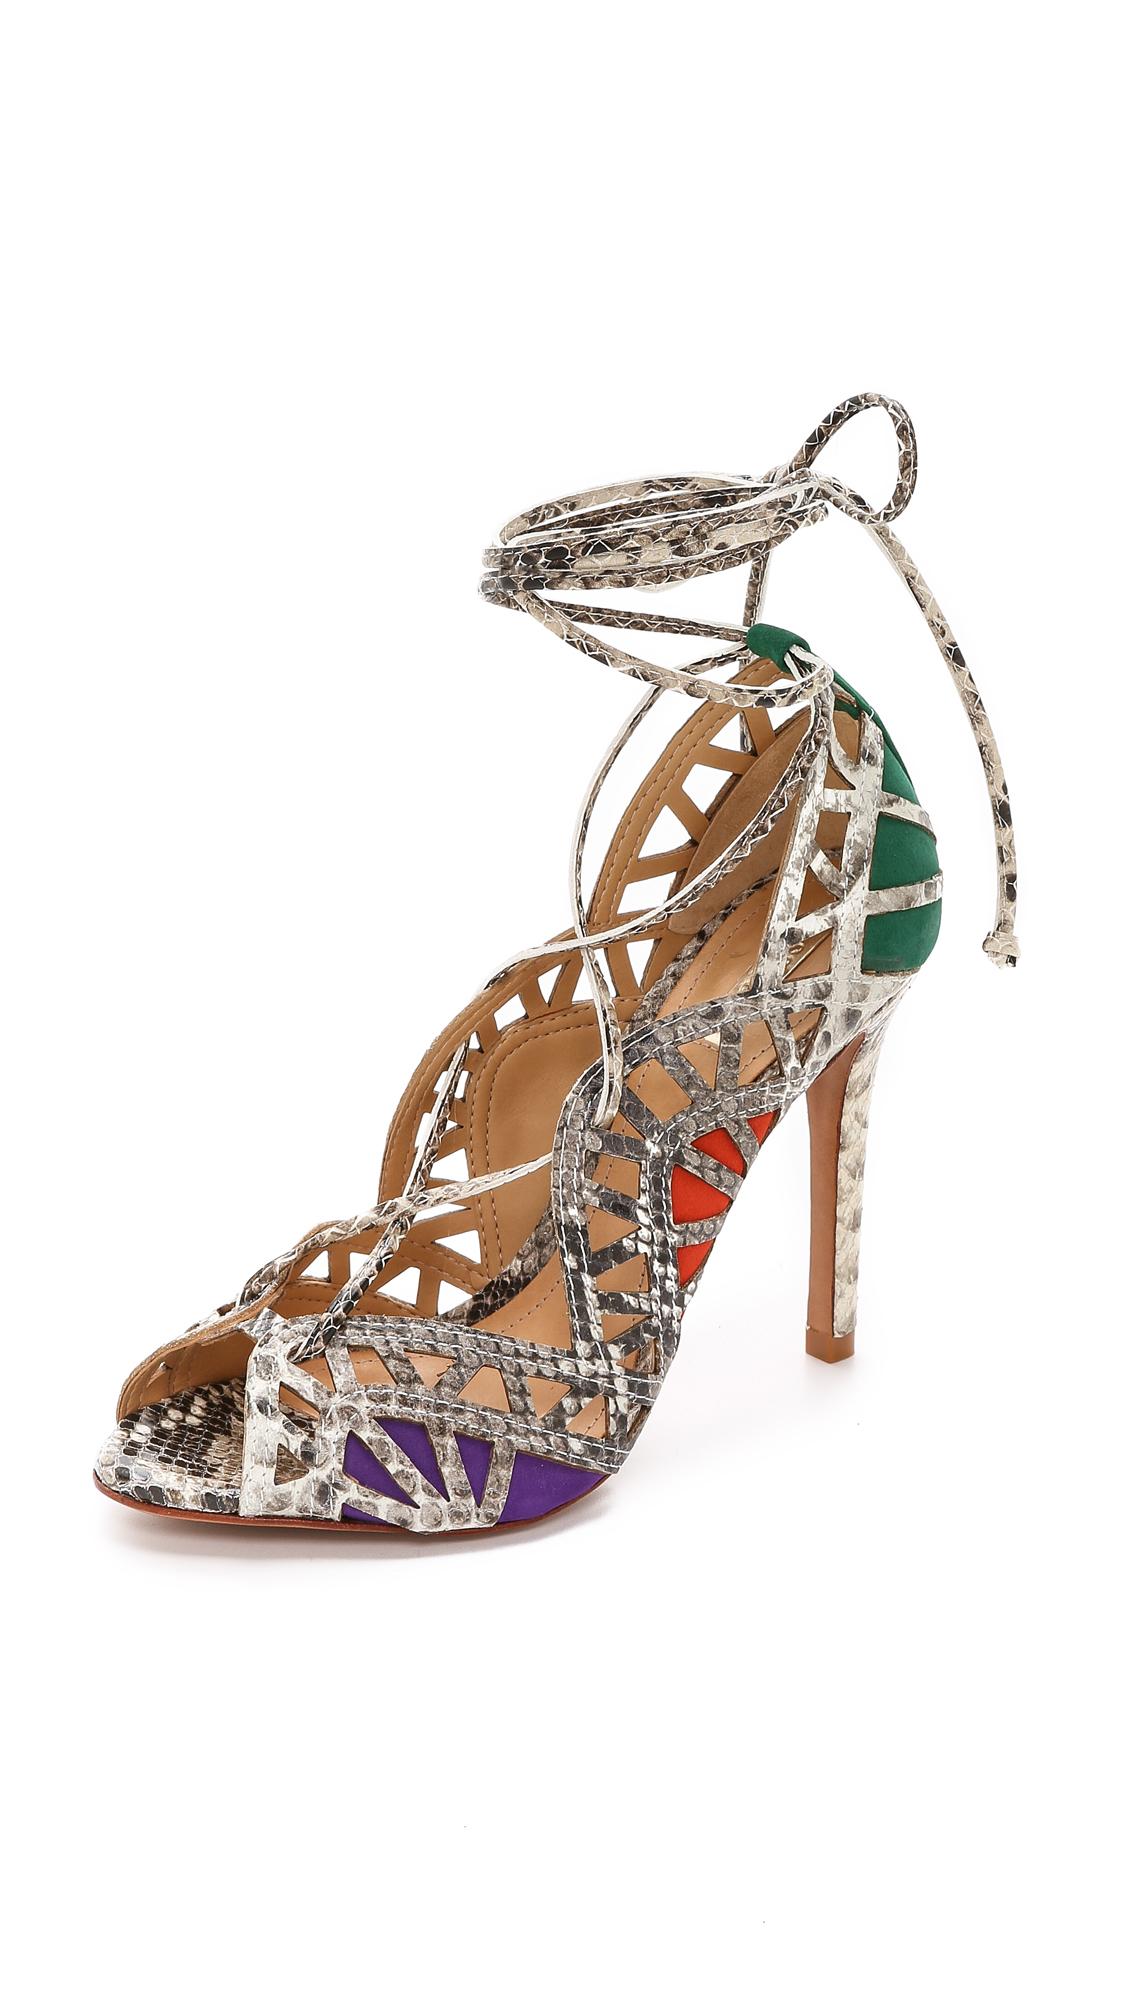 f3bd6036070 Lyst - Schutz Dubianna Lace Up Sandals - Pearl rosema